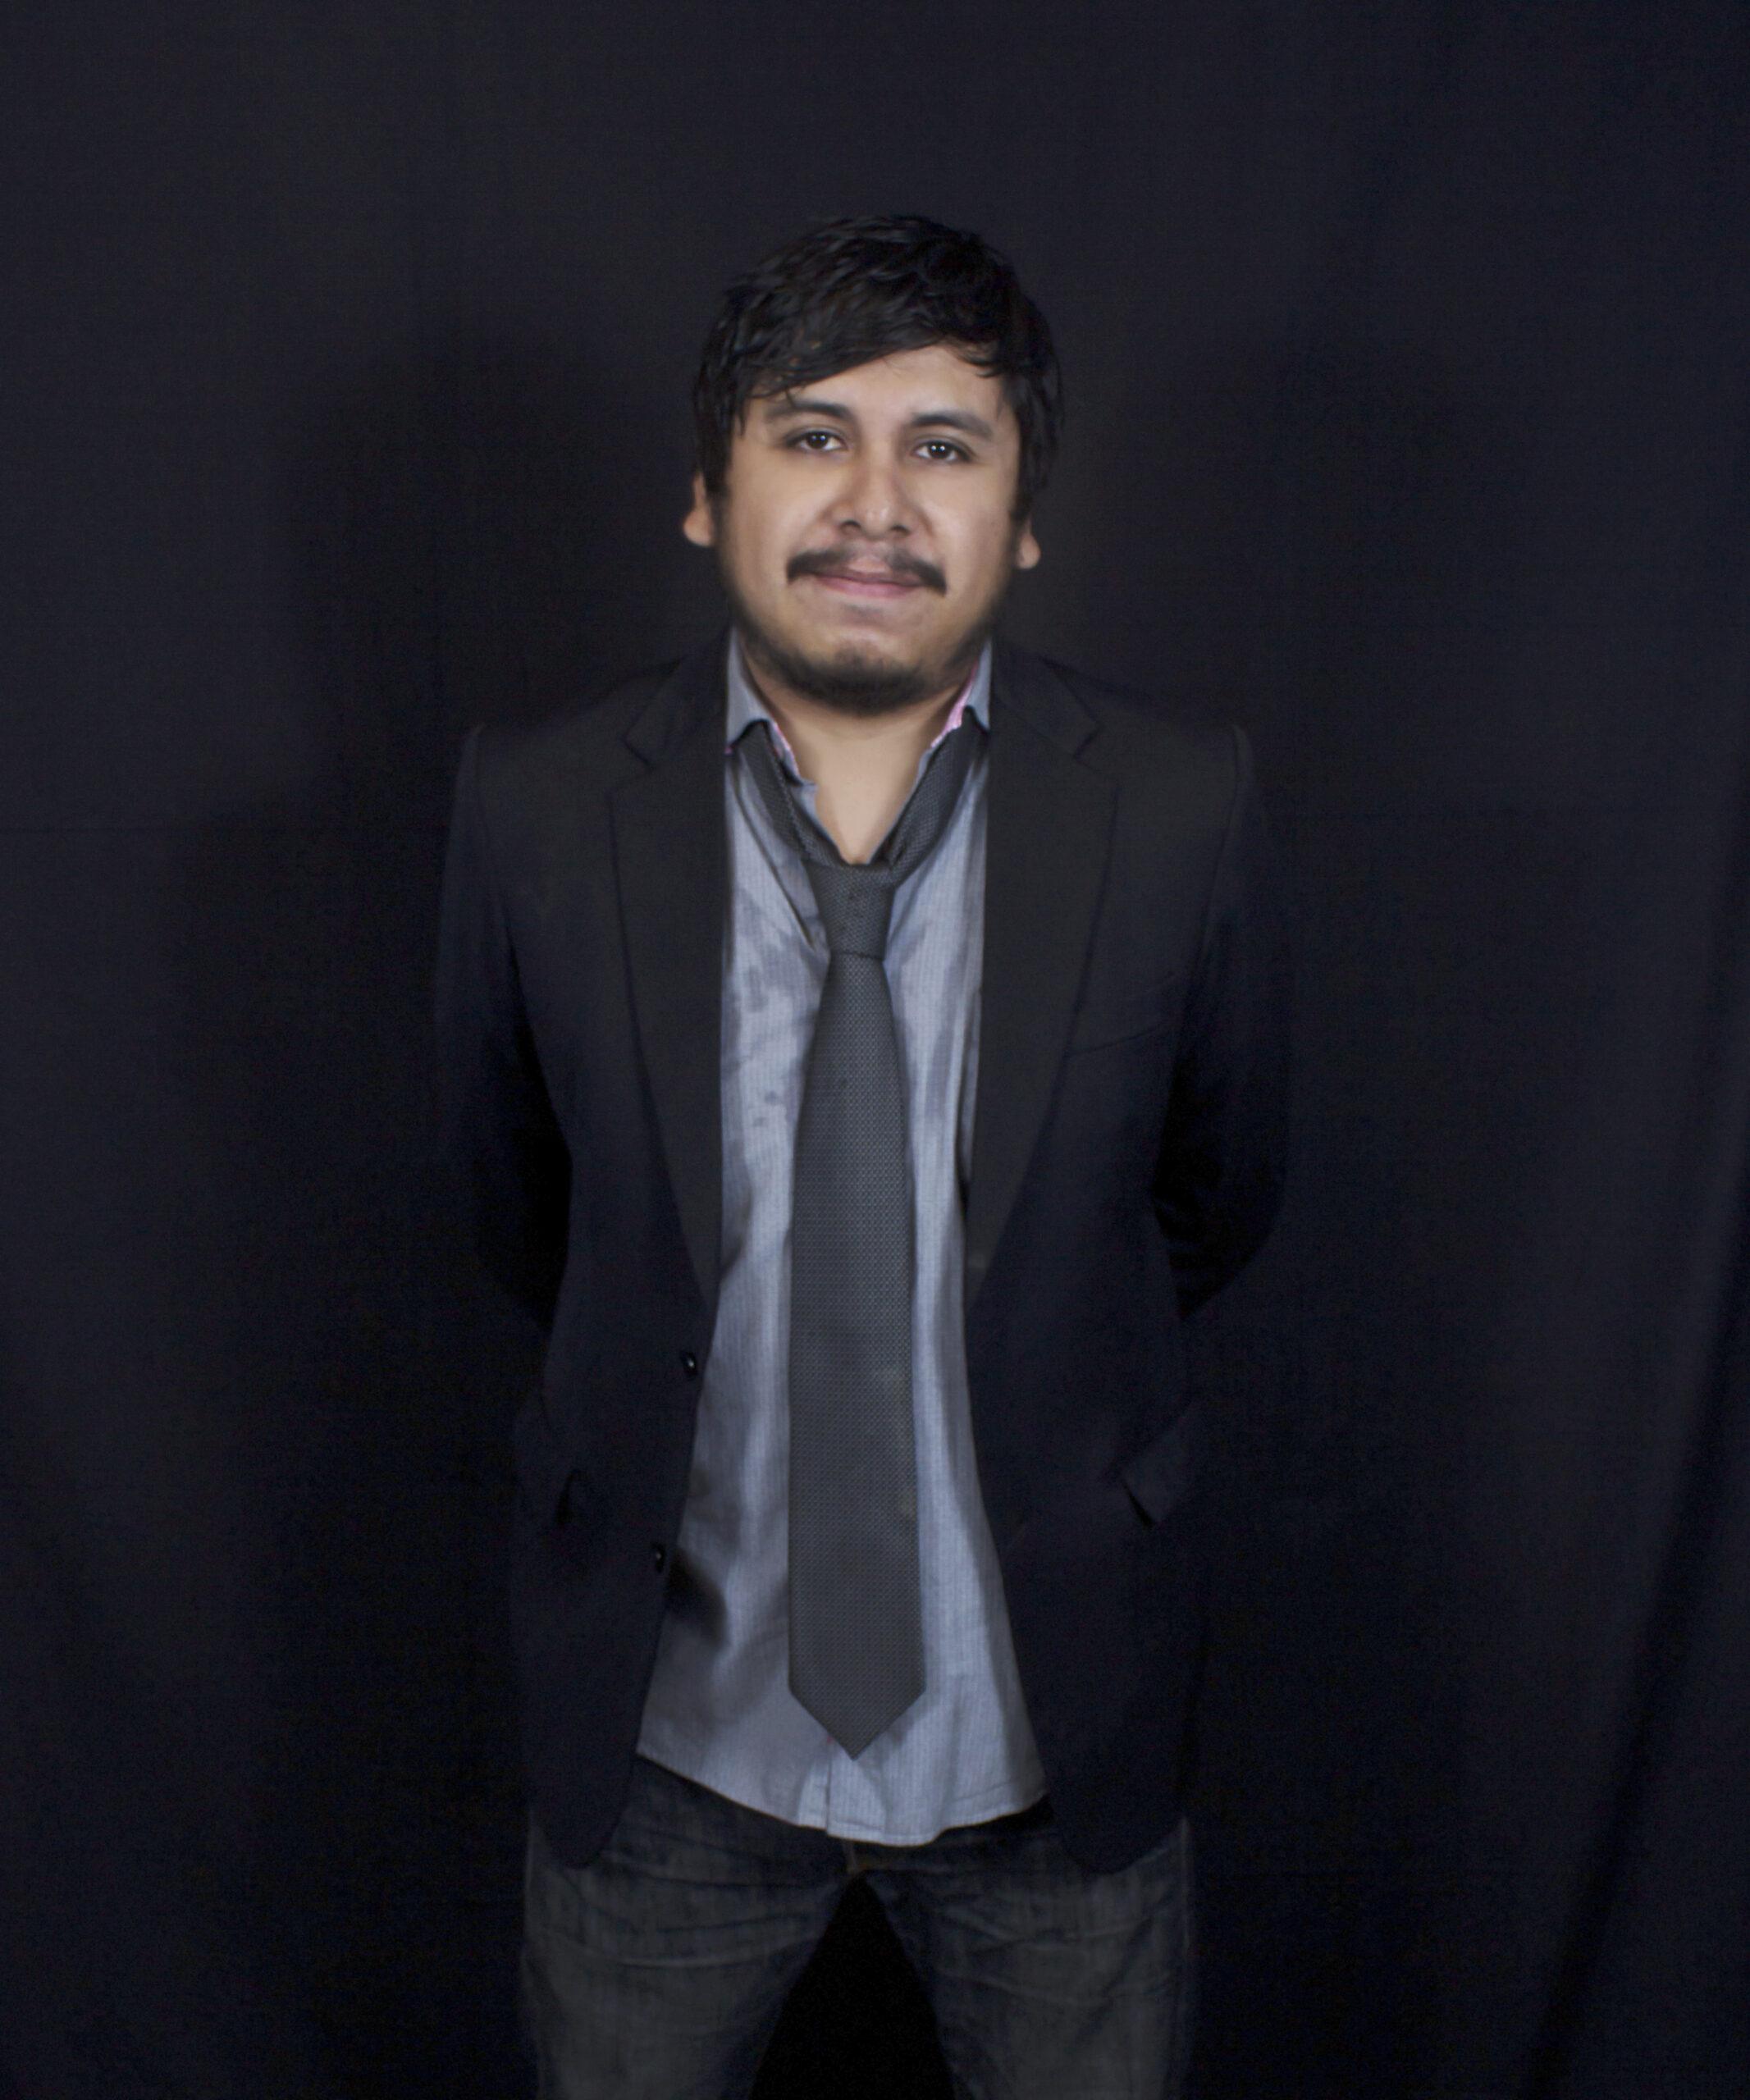 José Gustavo Hau Salgado